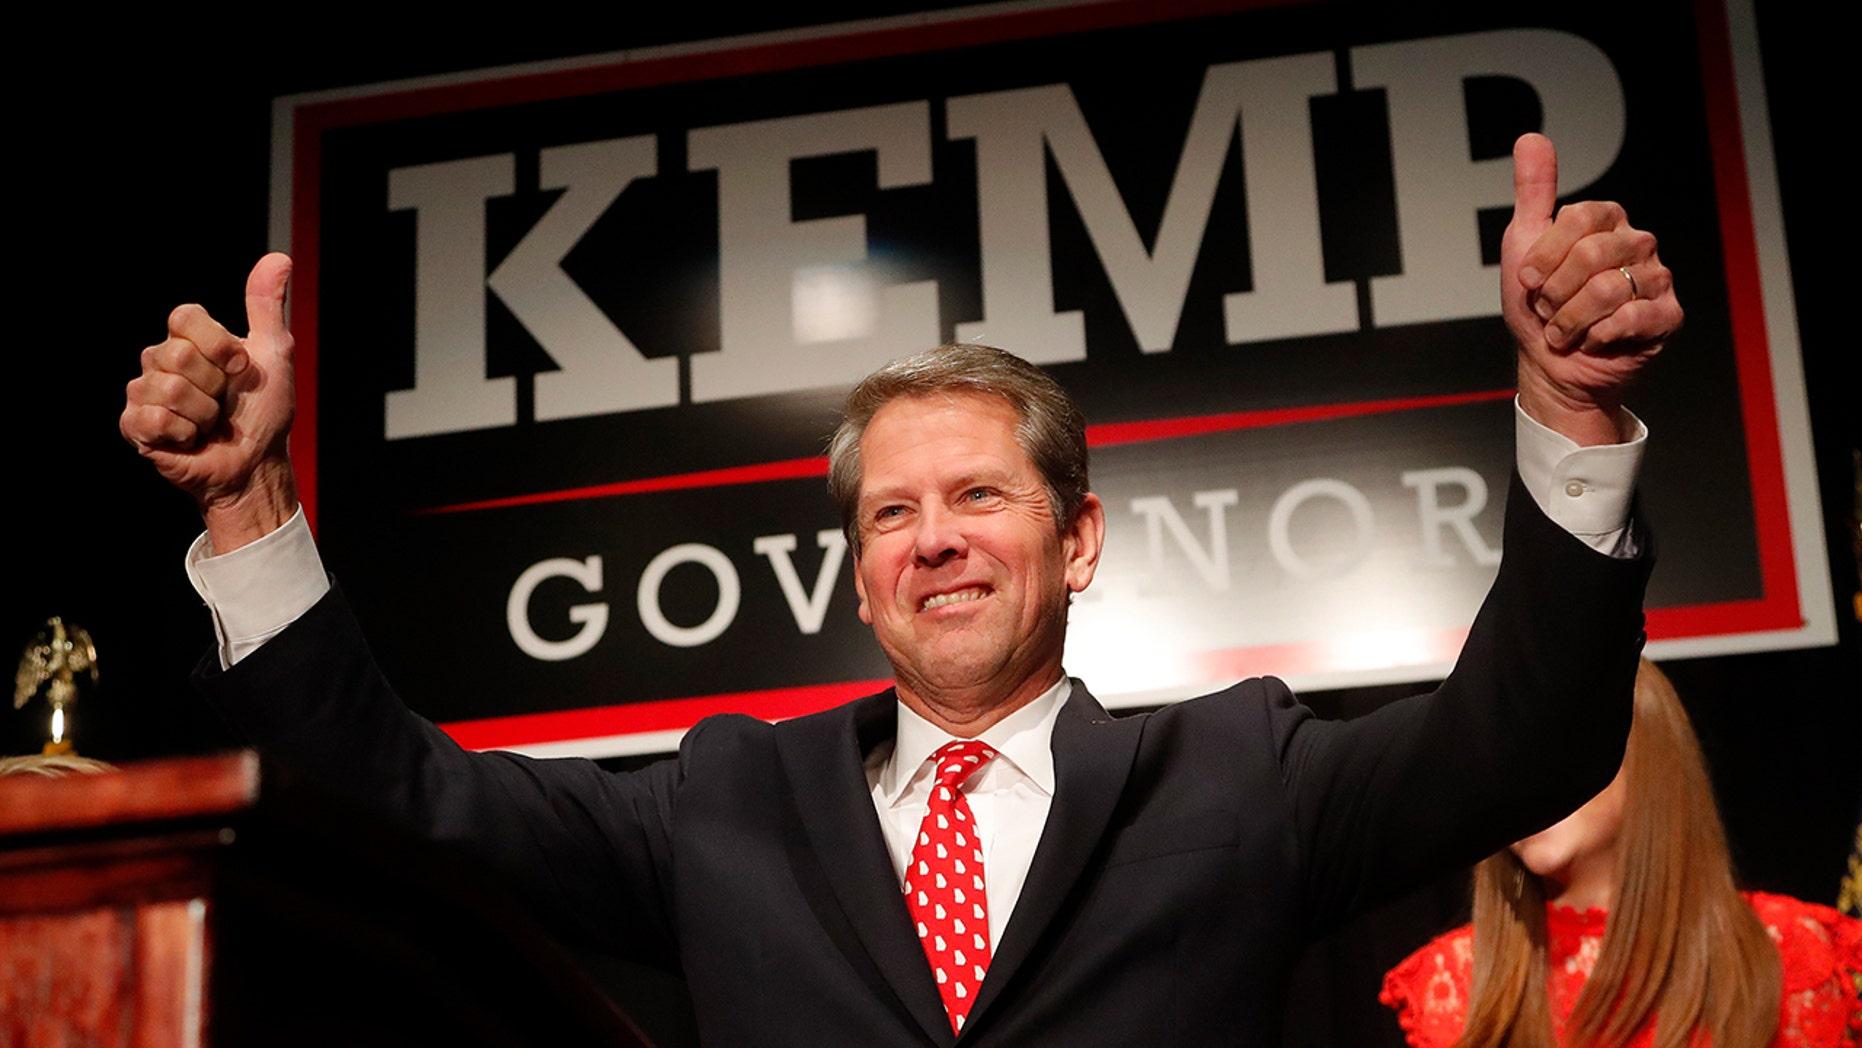 Stacey Abrams calls Kemp Georgia's 'legal' governor, won't say he's legitimate